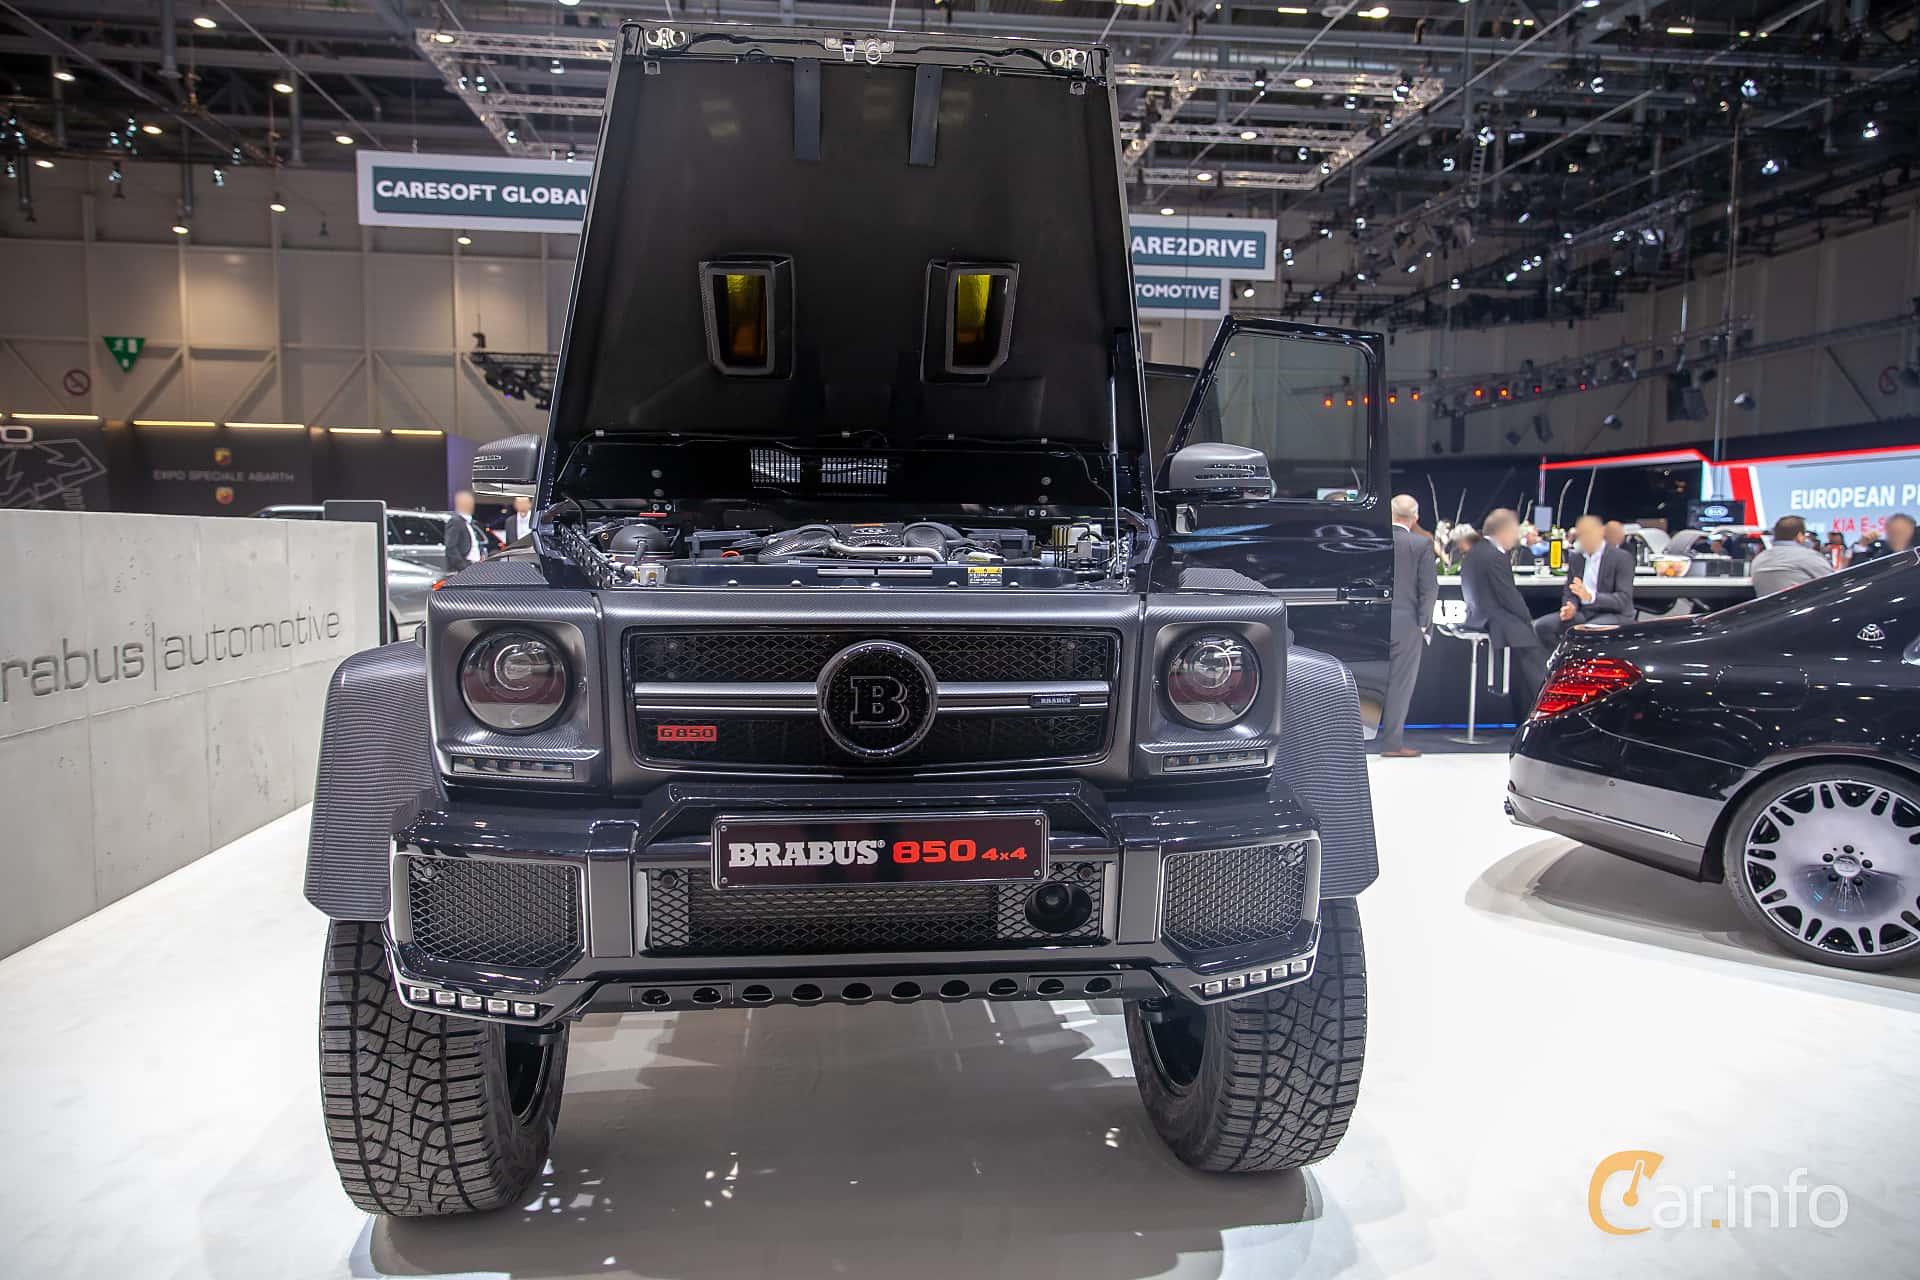 Front  of Brabus G 850  AMG-SpeedShift Plus 7G-Tronic, 850ps, 2019 at Geneva Motor Show 2019